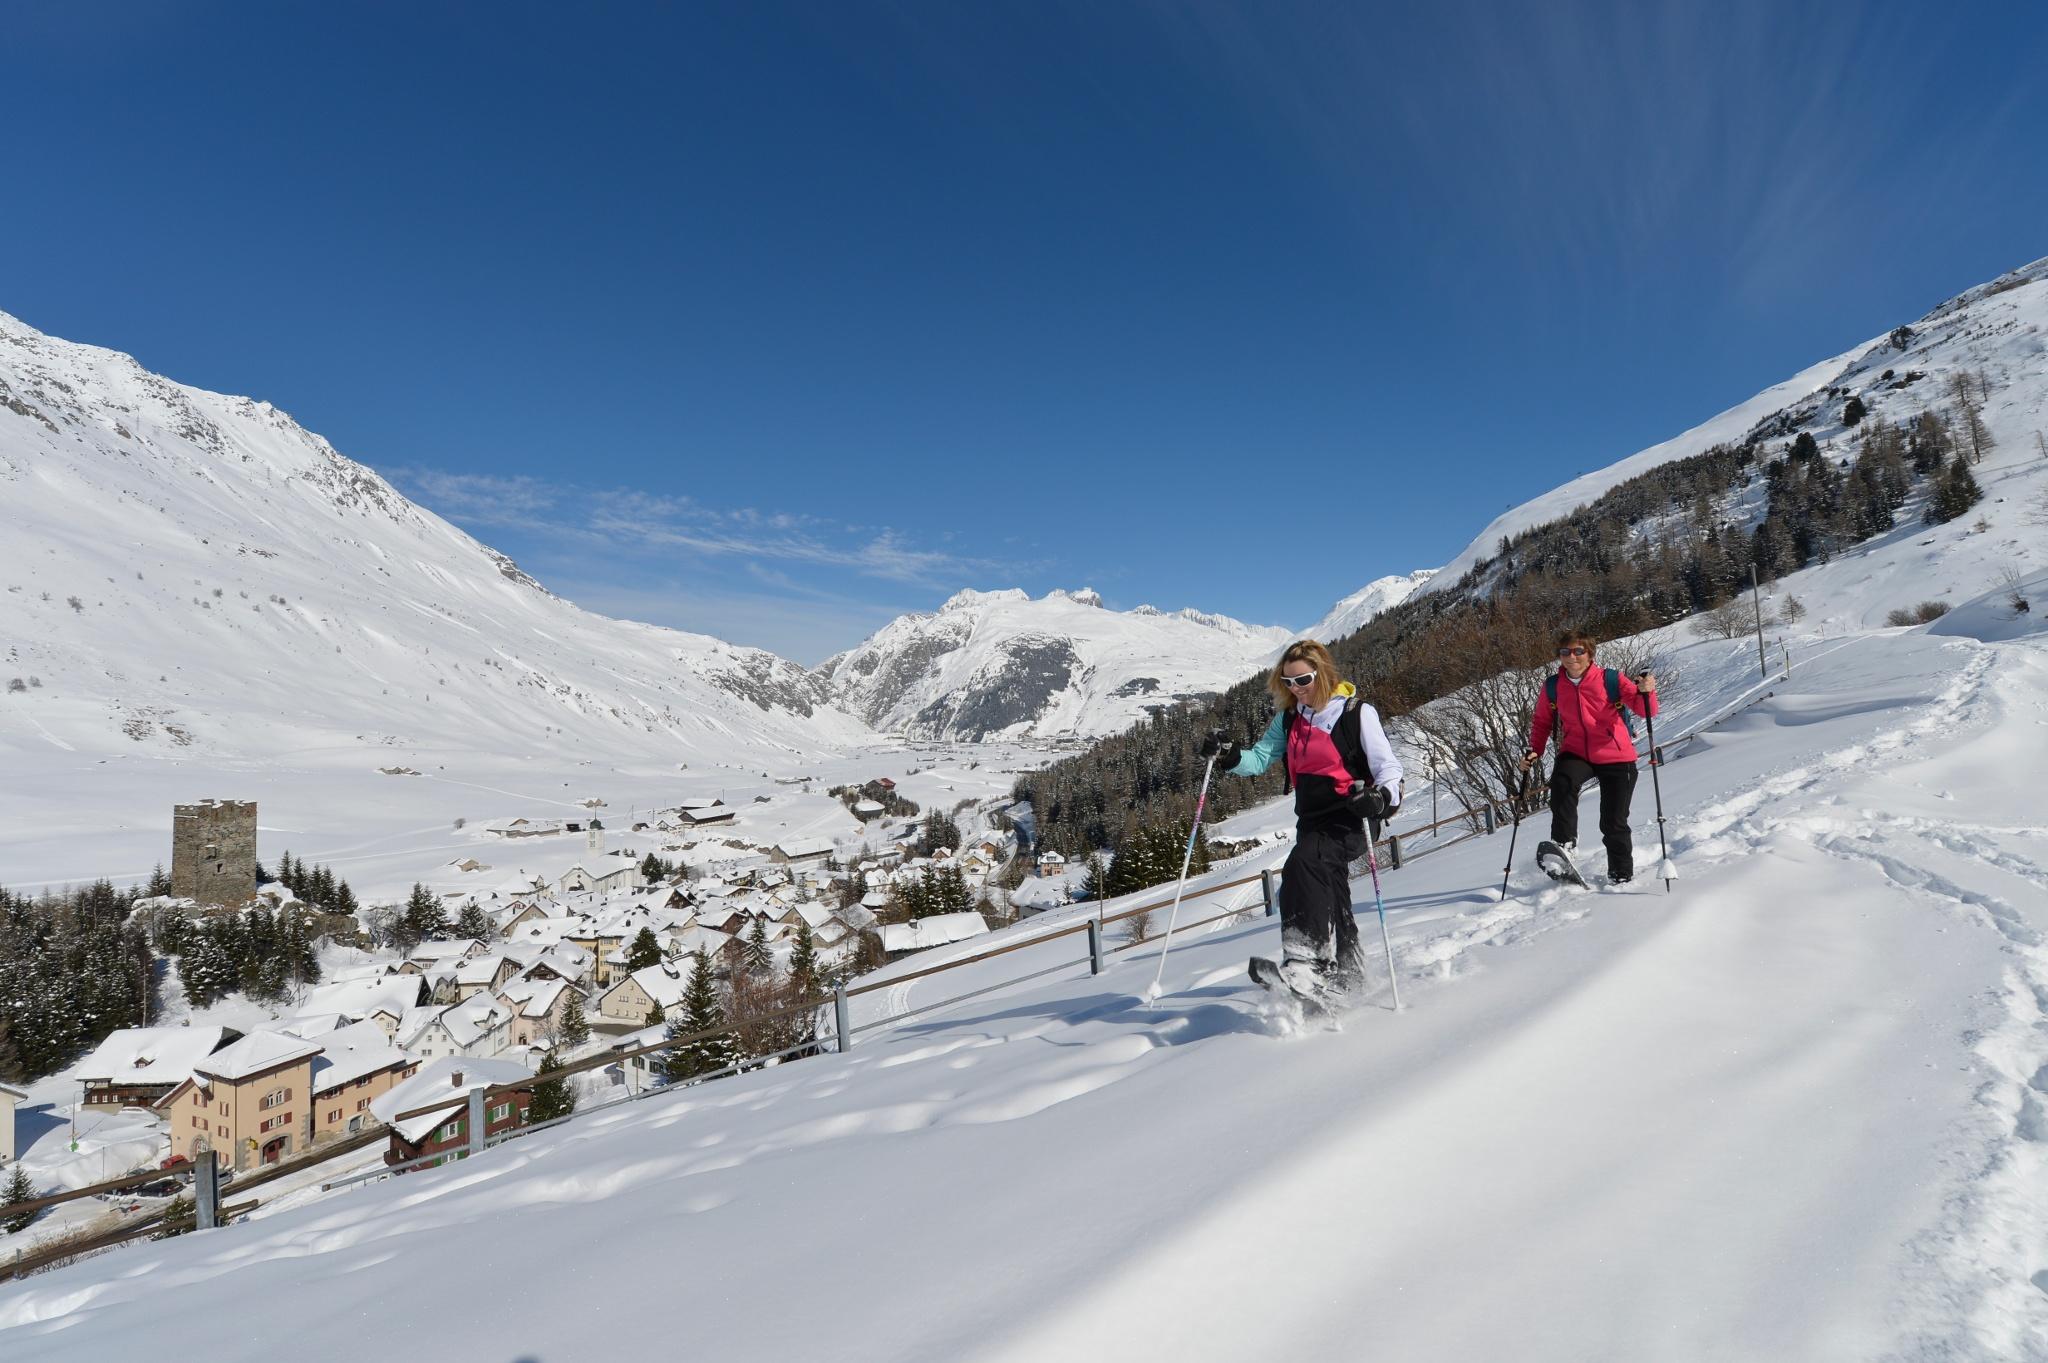 Auf Schneeschuhen unterwegs oberhalb Hospental